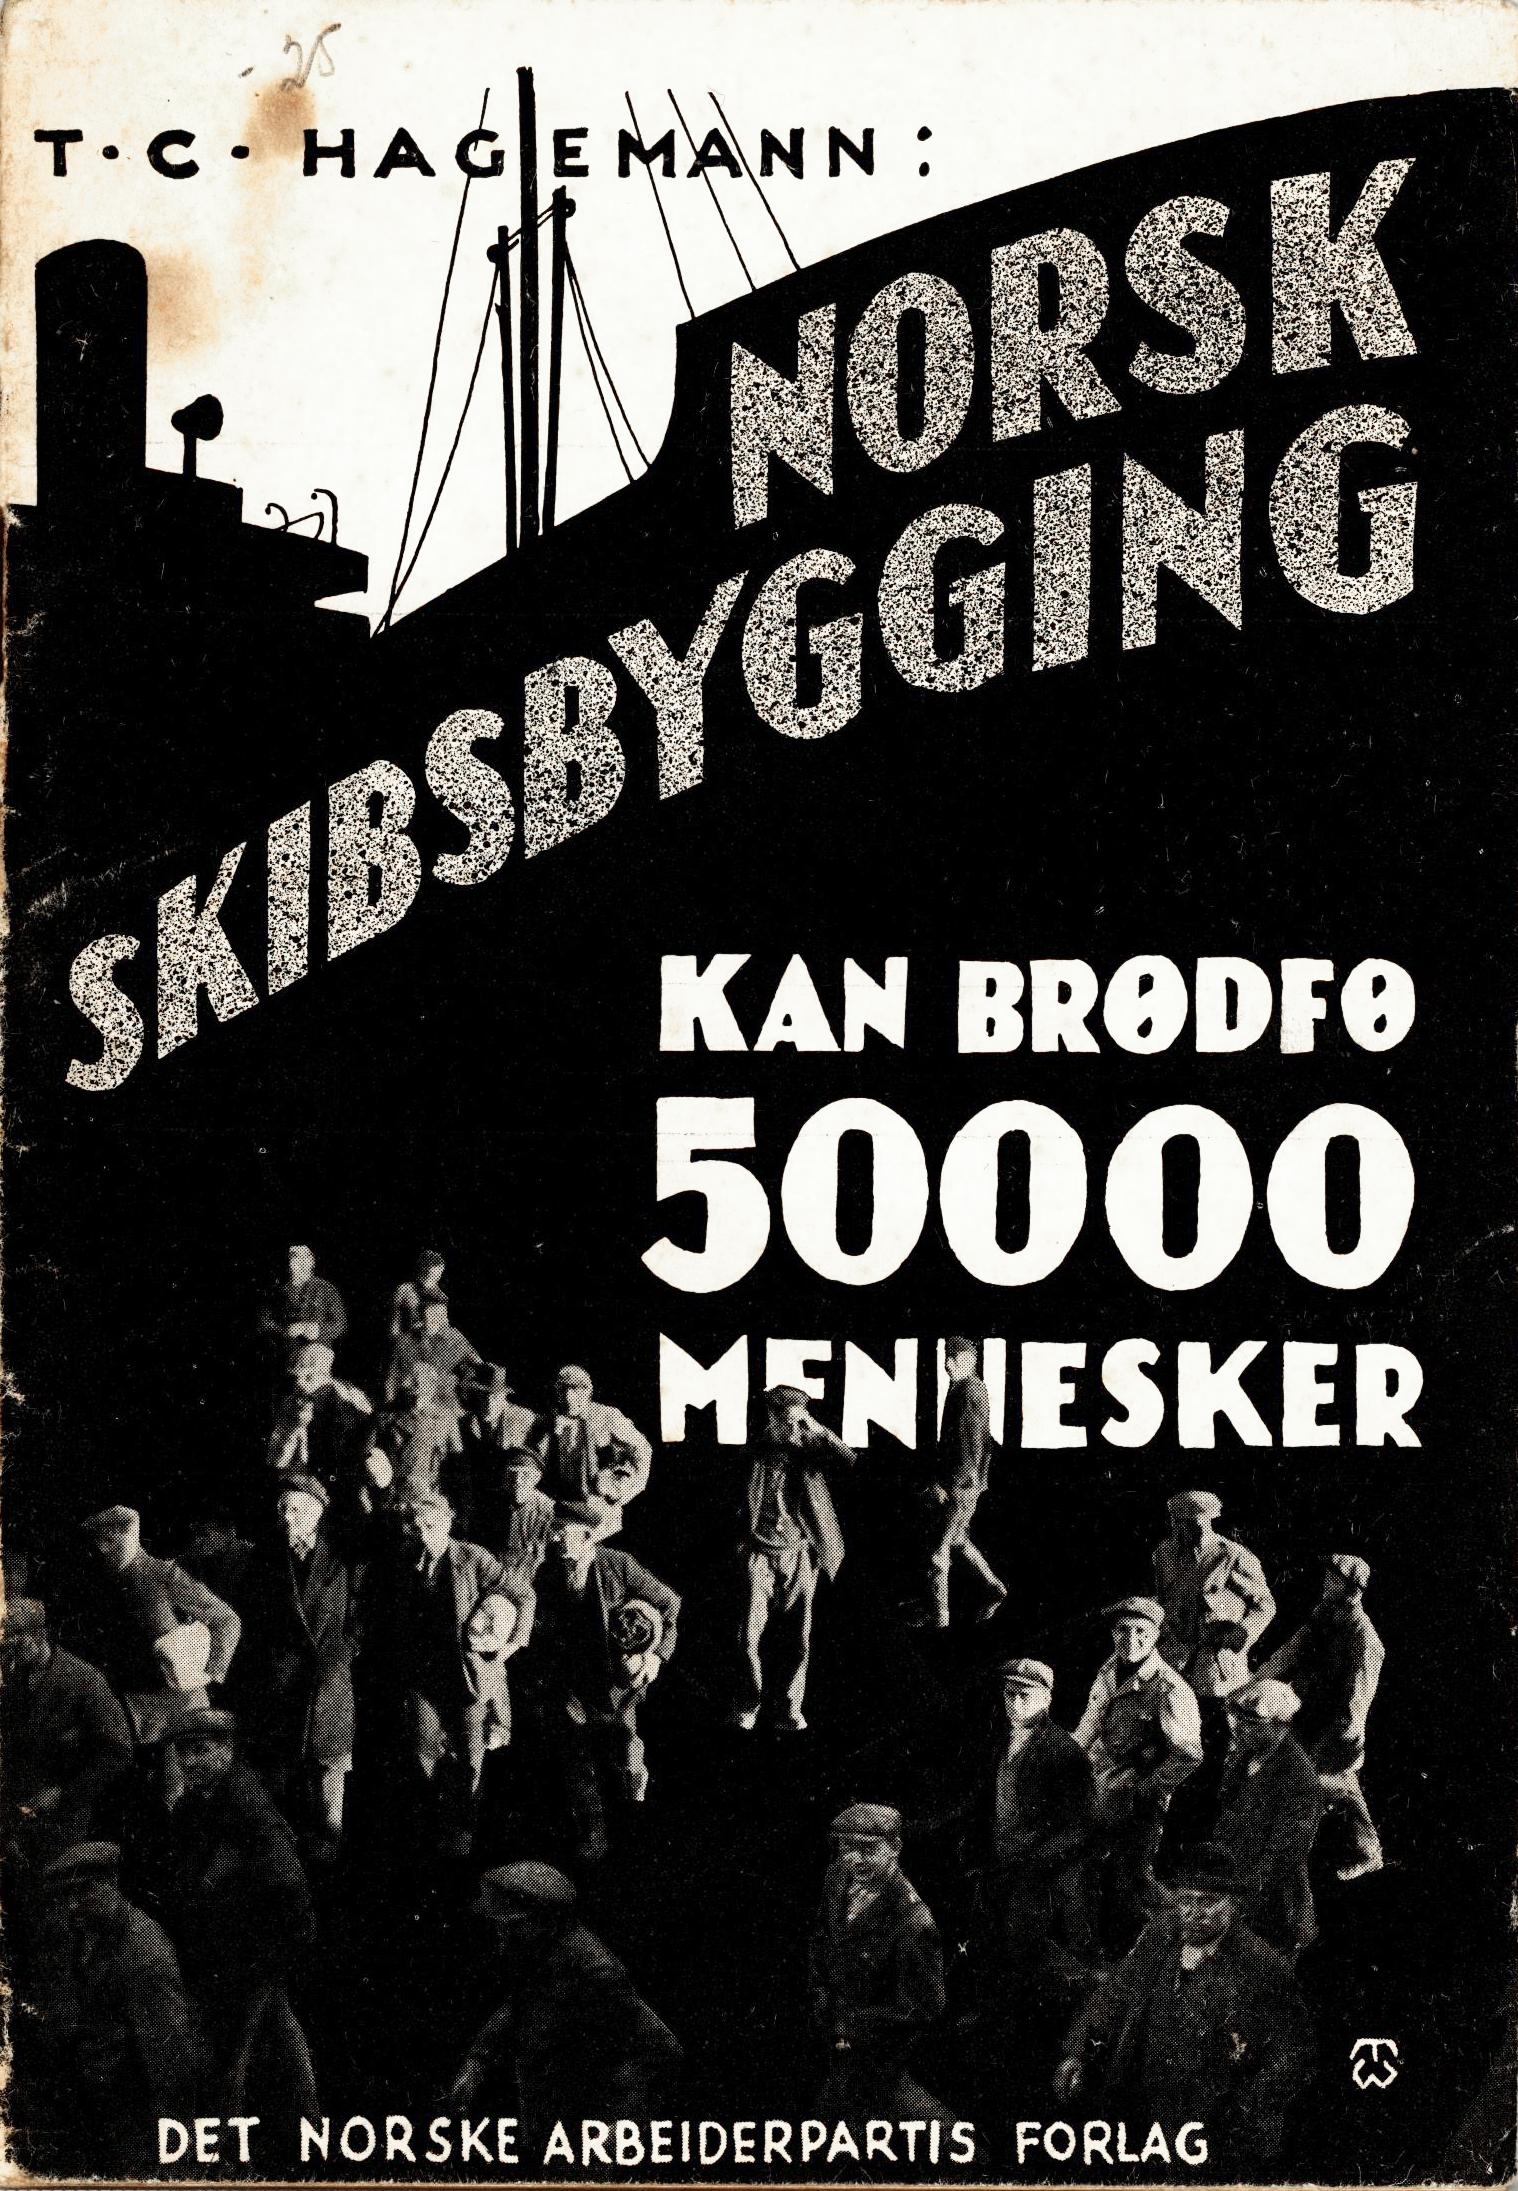 T. C. Hagemann: Norsk skibsbygging kan brødfø 50000 mennesker